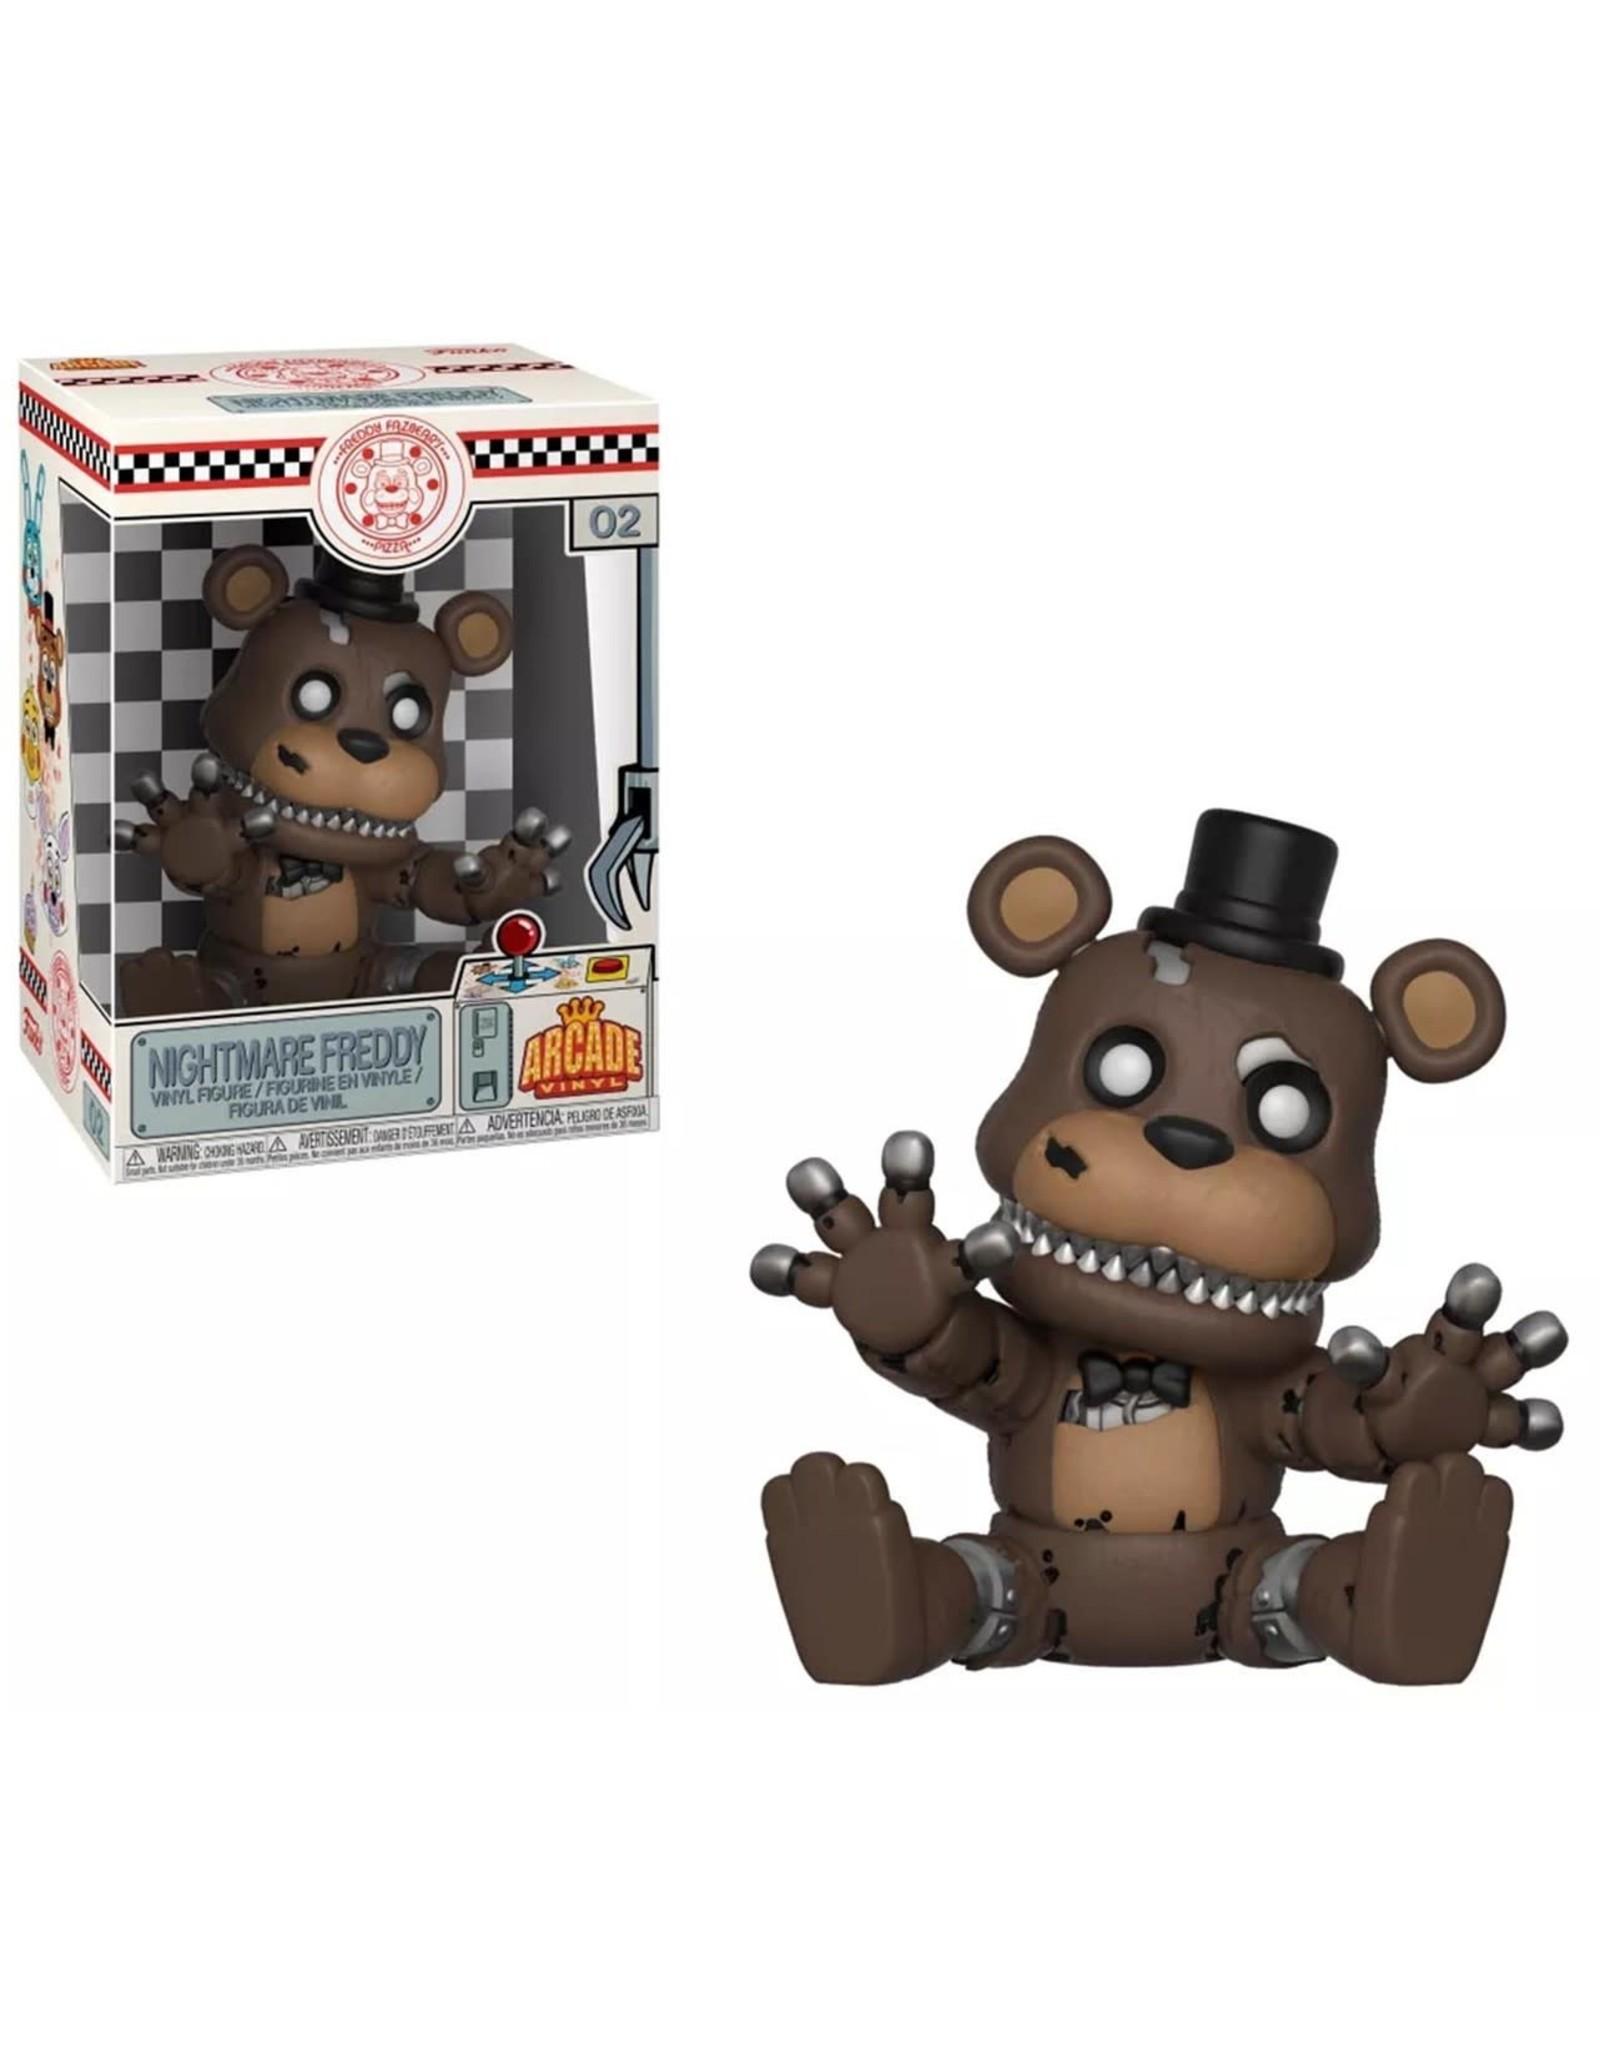 Funko Pop! Funko Arcade Vinyl Five Nights at Freddy's nr02 - Nightmare Freddy